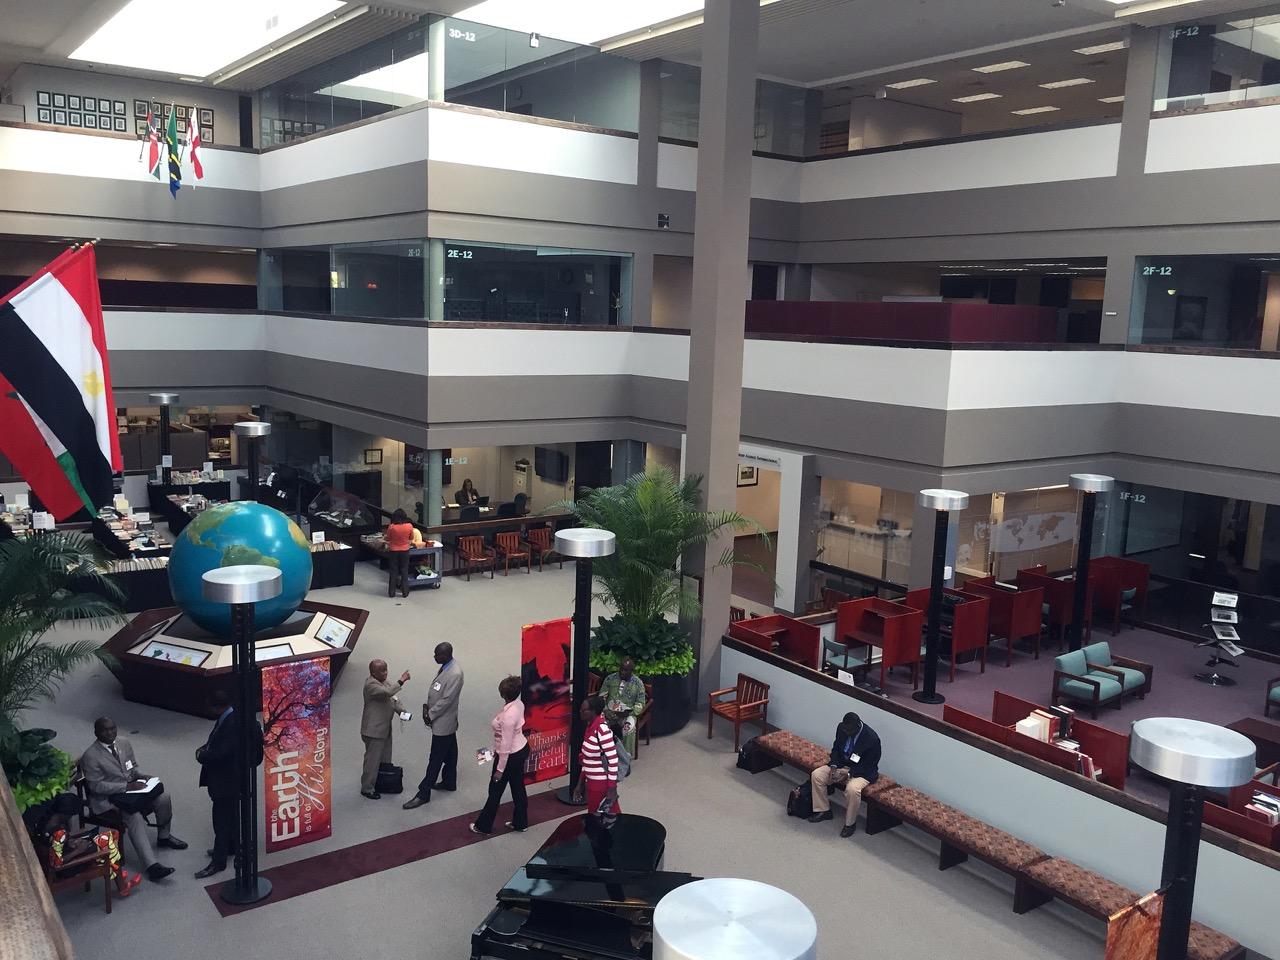 Inside the Seventh-day Adventist Church world headquarters.